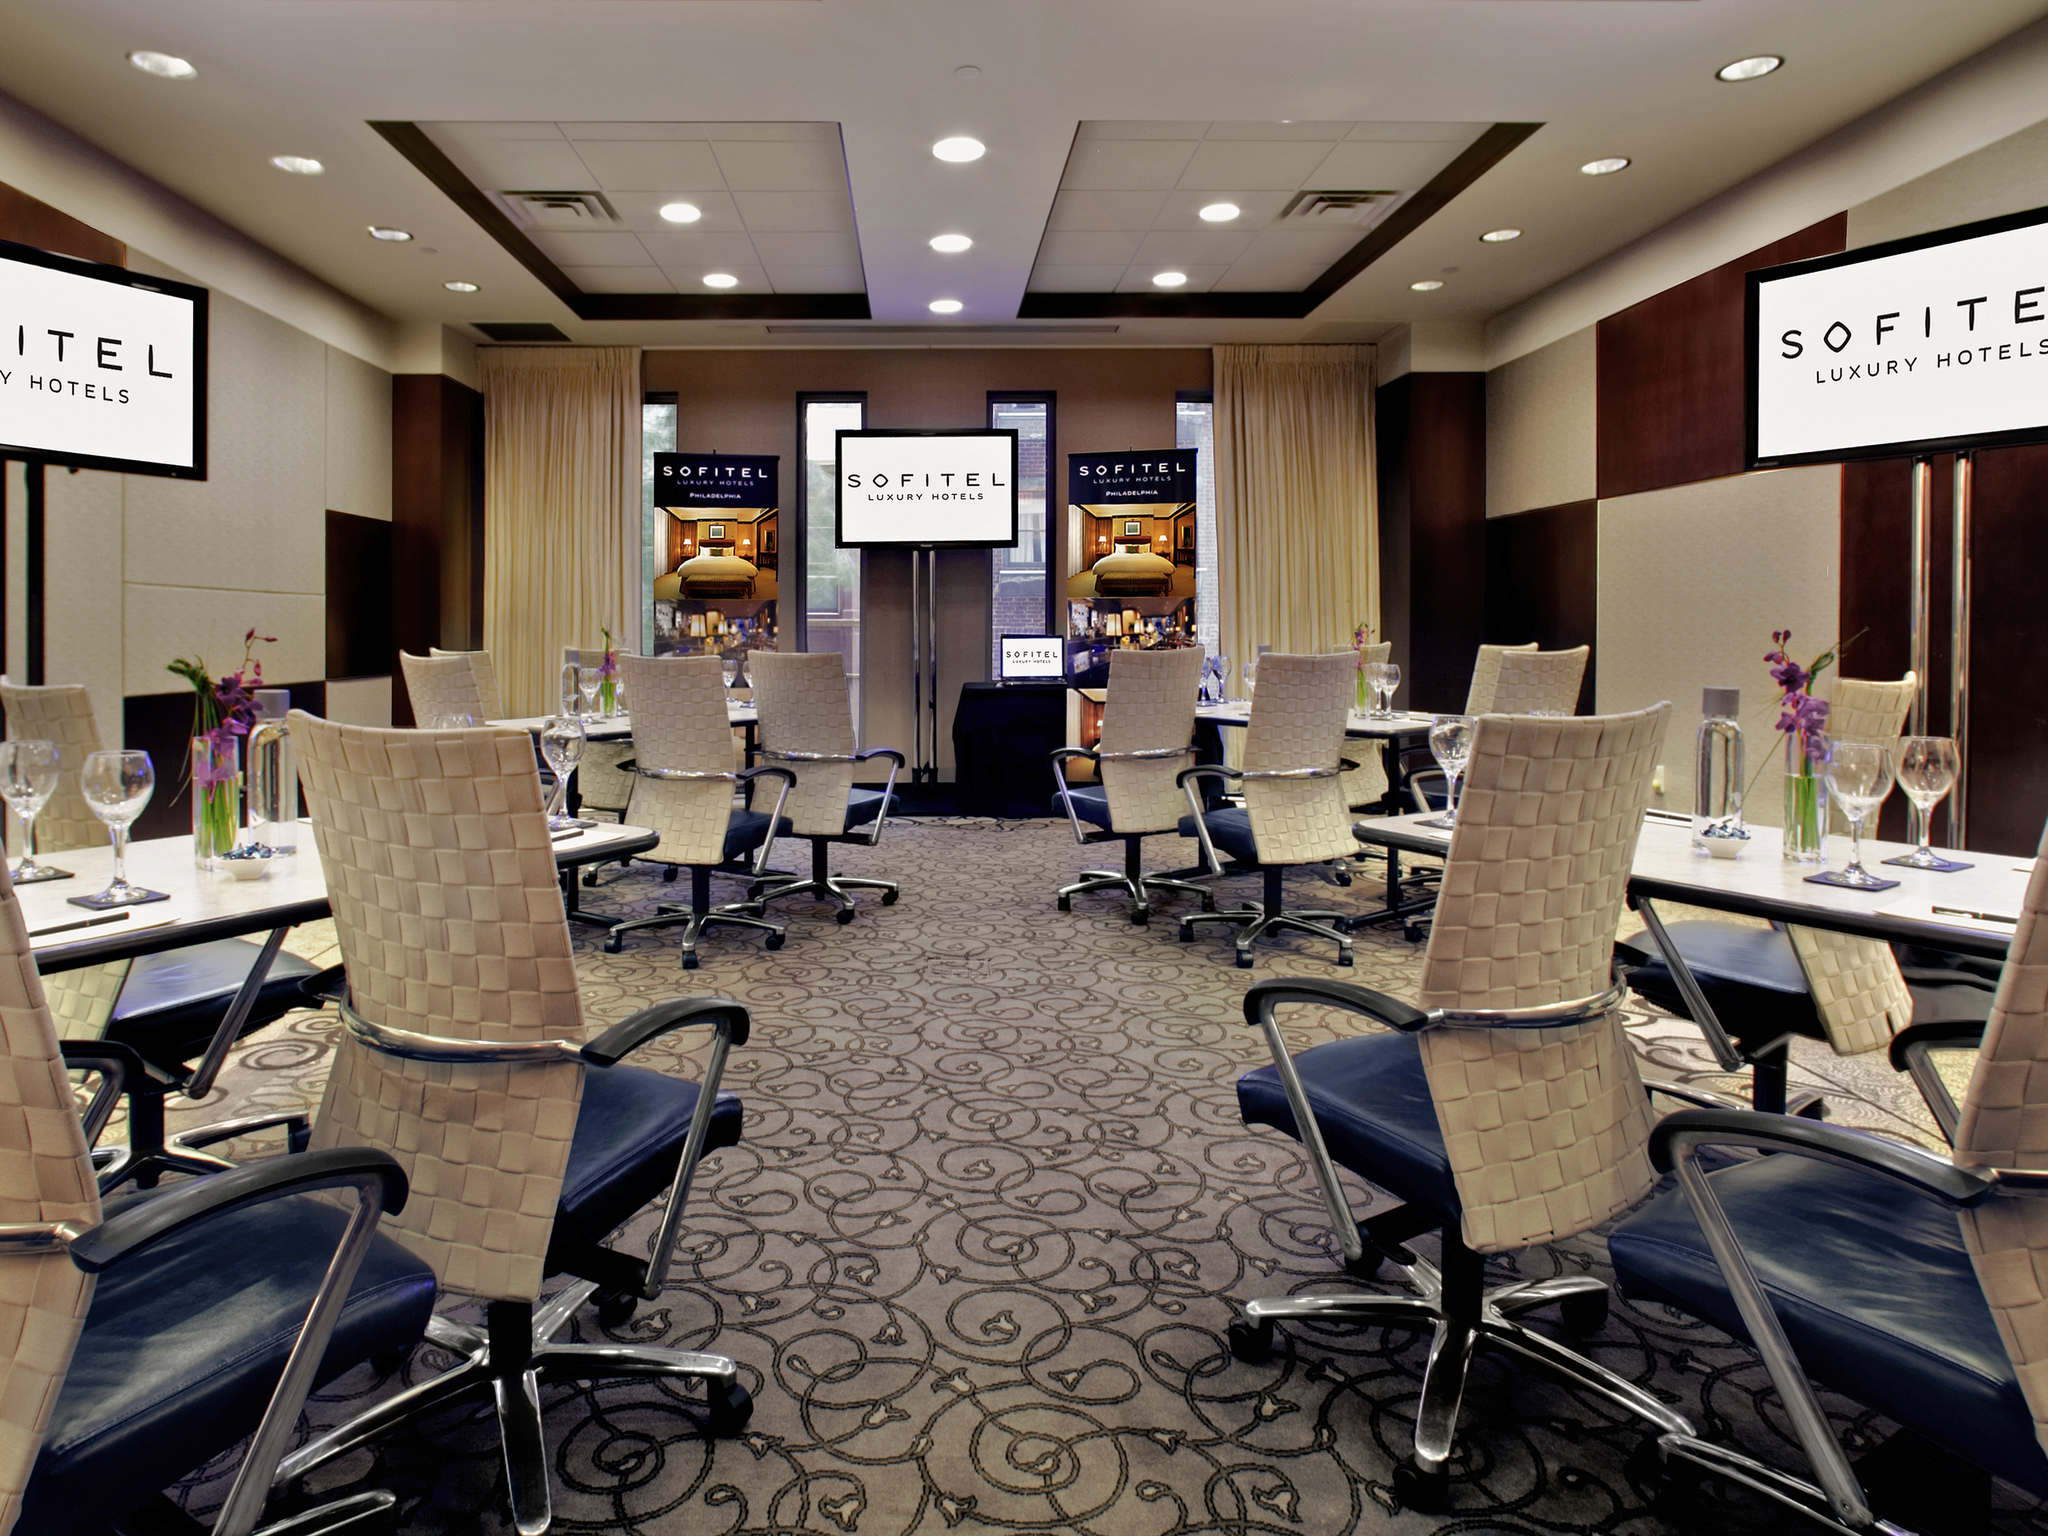 Hotel In Philadelphia Sofitel Philadelphia - 8 awesome extras in luxury hotel rooms